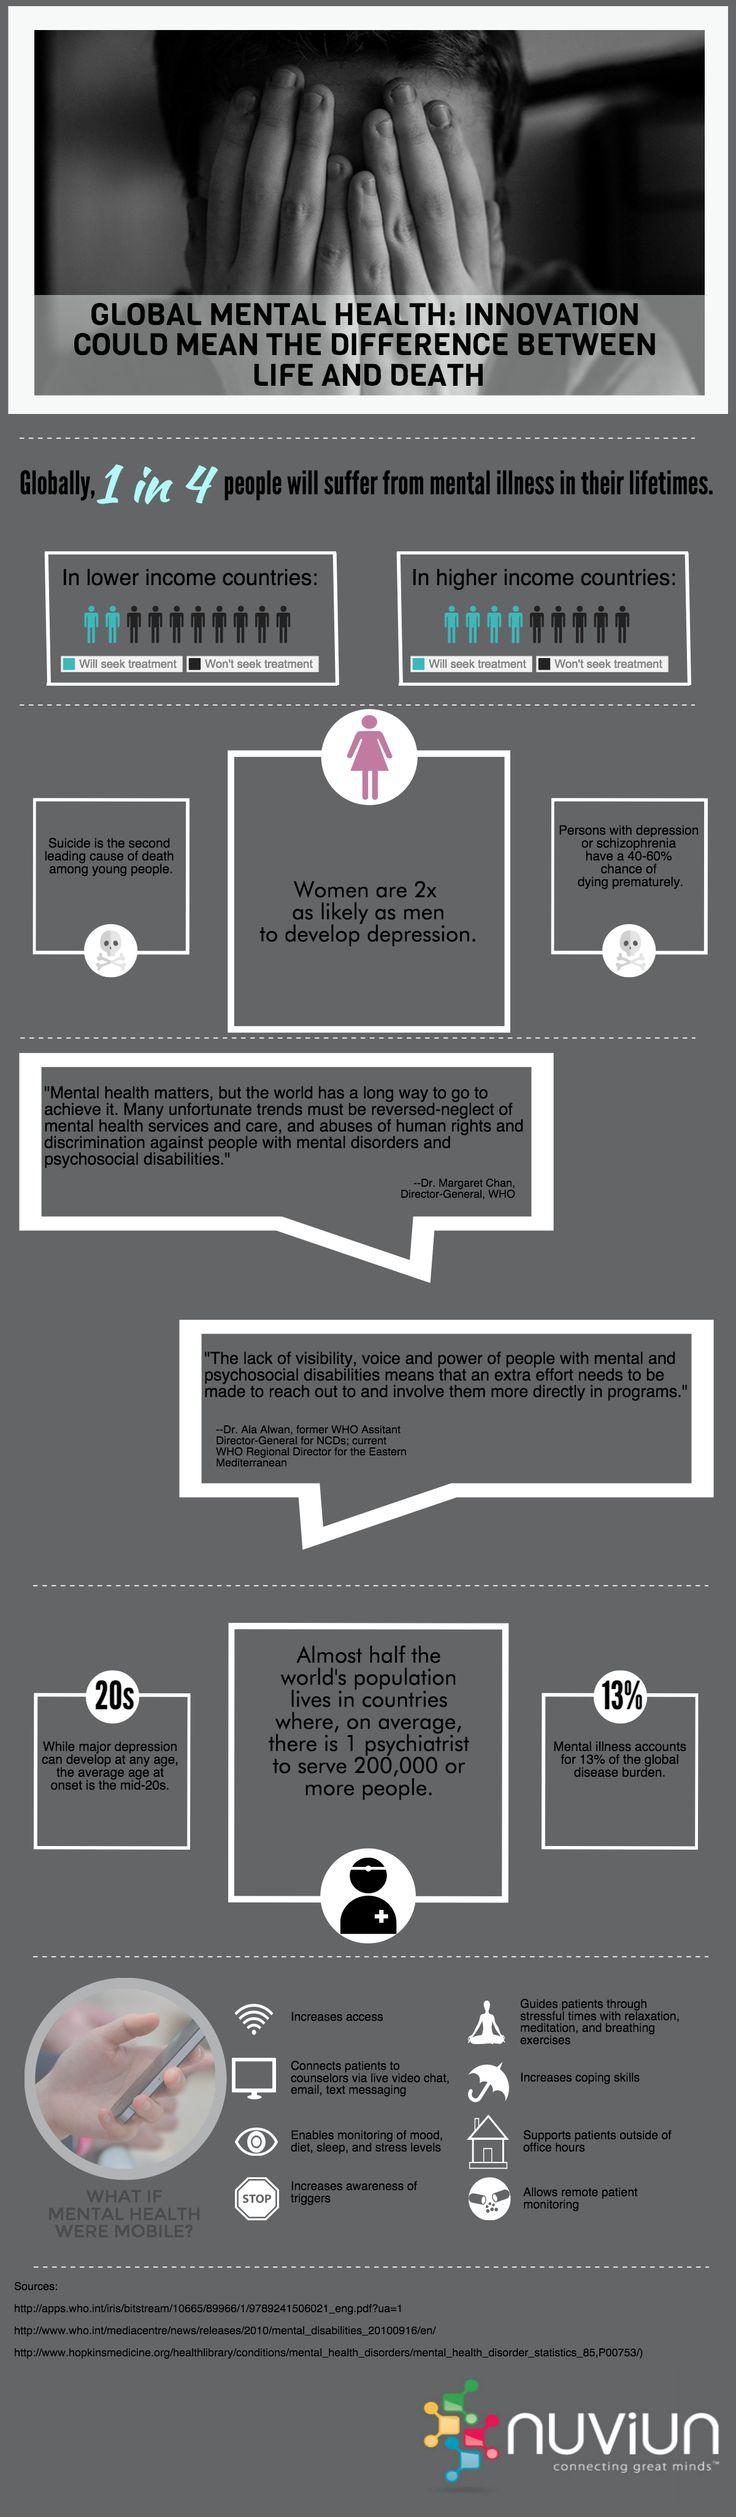 #INFOGRAPHIC: Why Innovation is Needed in Global #MentalHealth via @nuviun. #TeleHealth #RichardAKimballjr http://bit.ly/1FgliNP